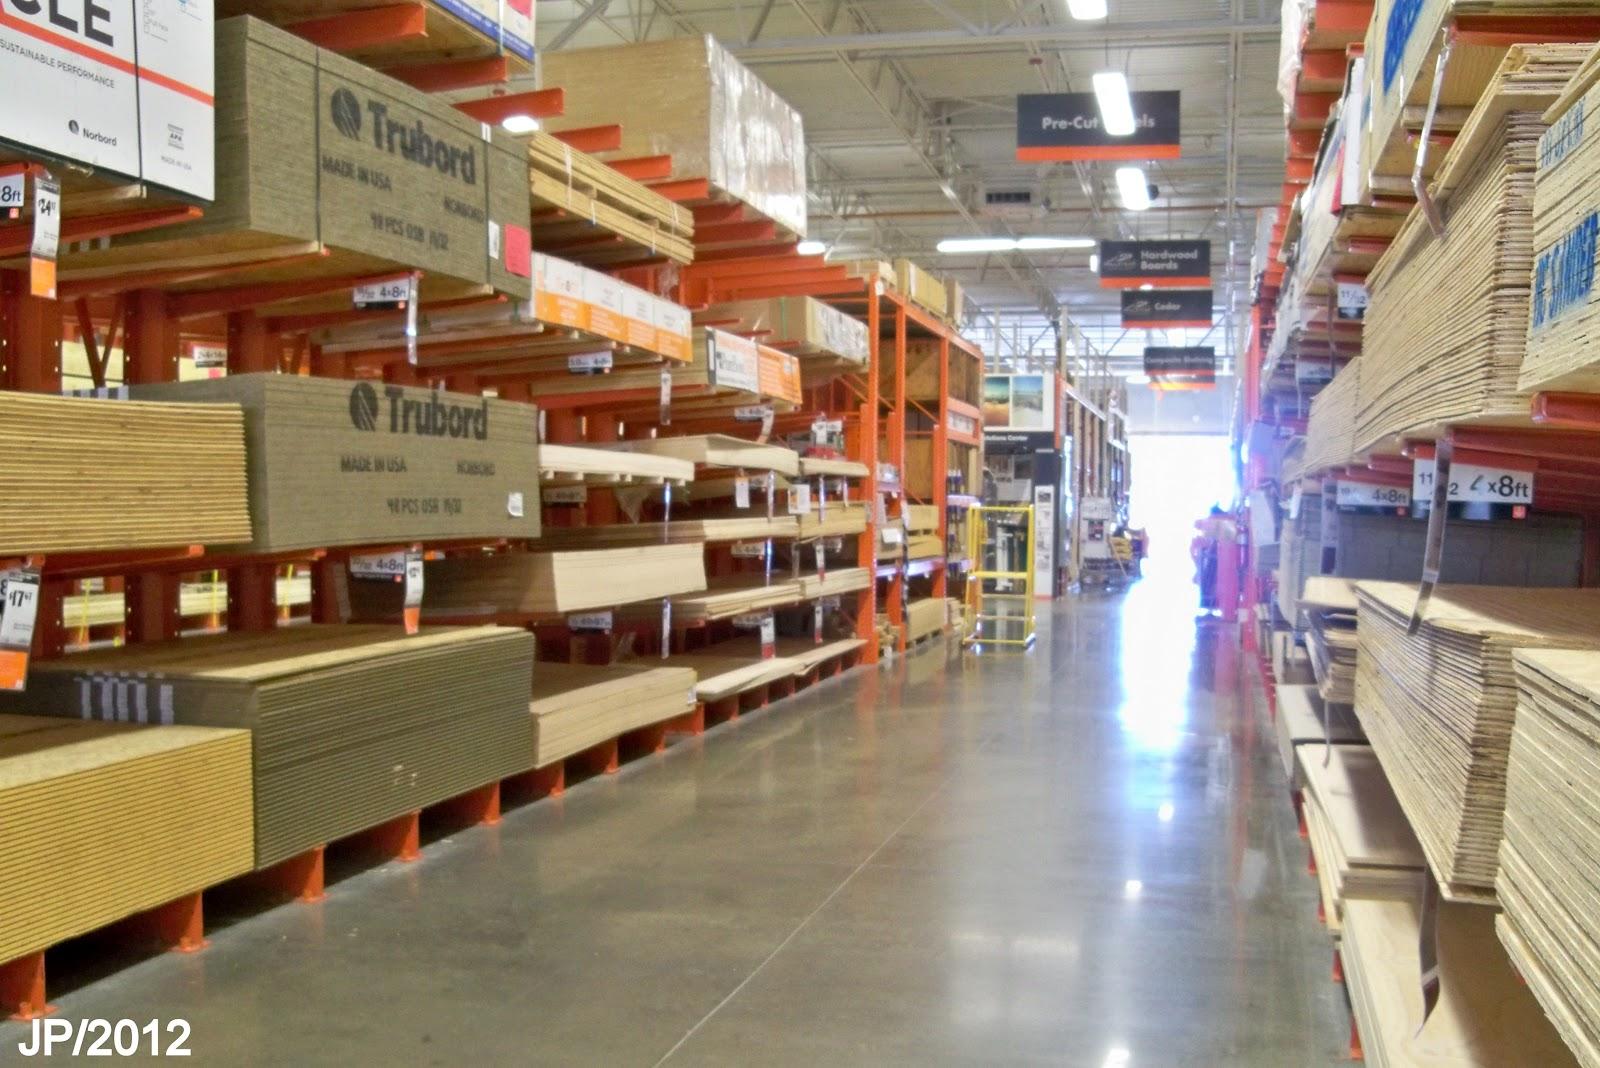 HOME DEPOT WARNER ROBINS GEORGIA Watson Blvd The Home Depot Improvement Warehouse Building Materials Hardware Store